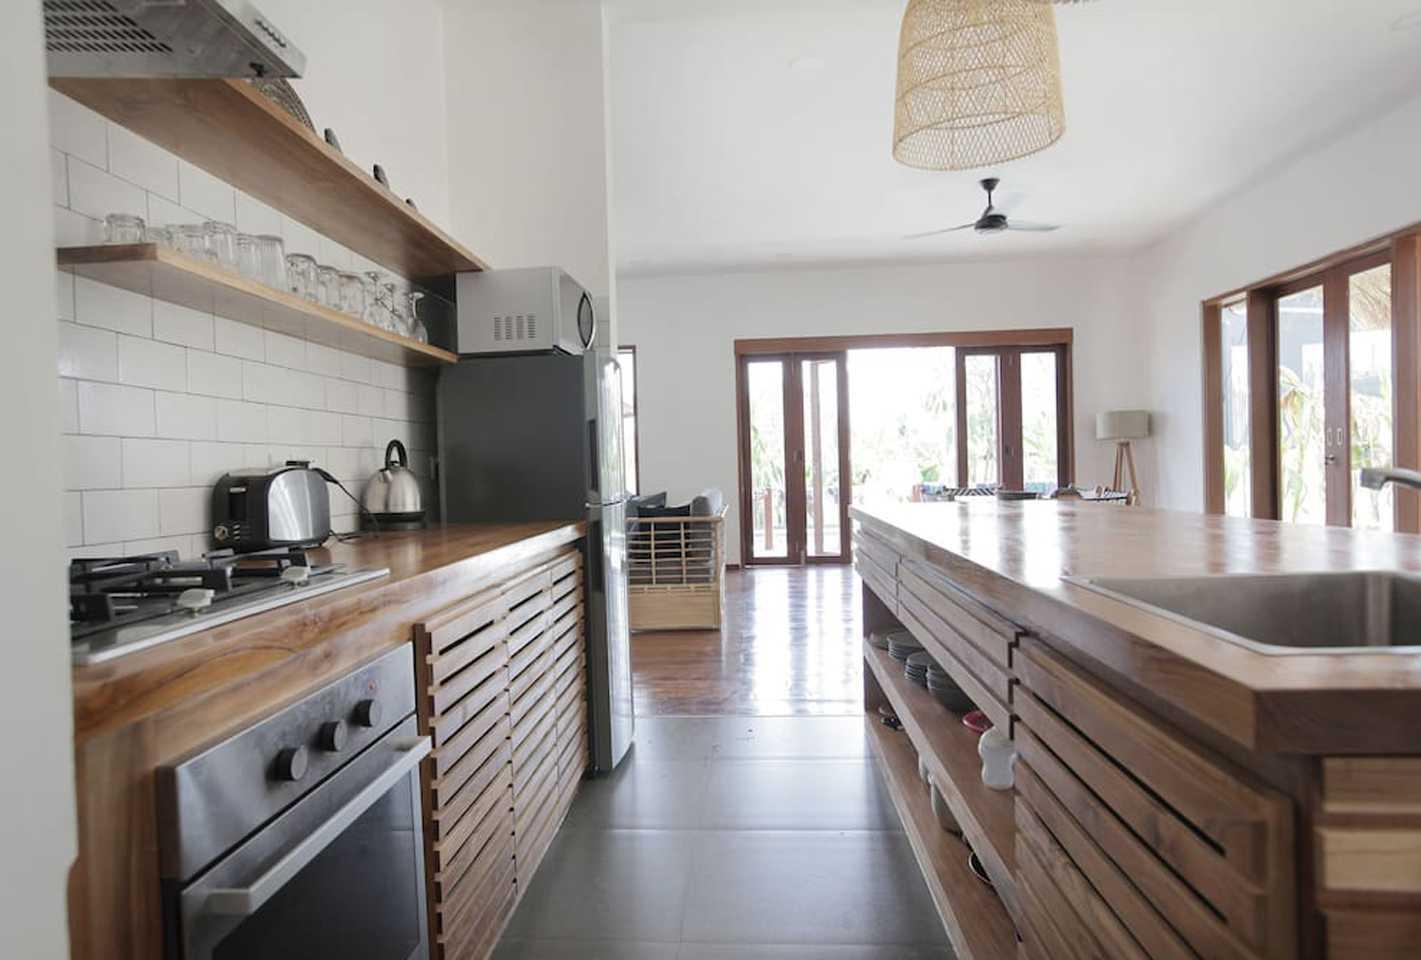 Hg Architects & Designers Associates Villa Pererenan Pererenan, Mengwi, Kabupaten Badung, Bali, Indonesia Pererenan, Mengwi, Kabupaten Badung, Bali, Indonesia Kitchen View  48587